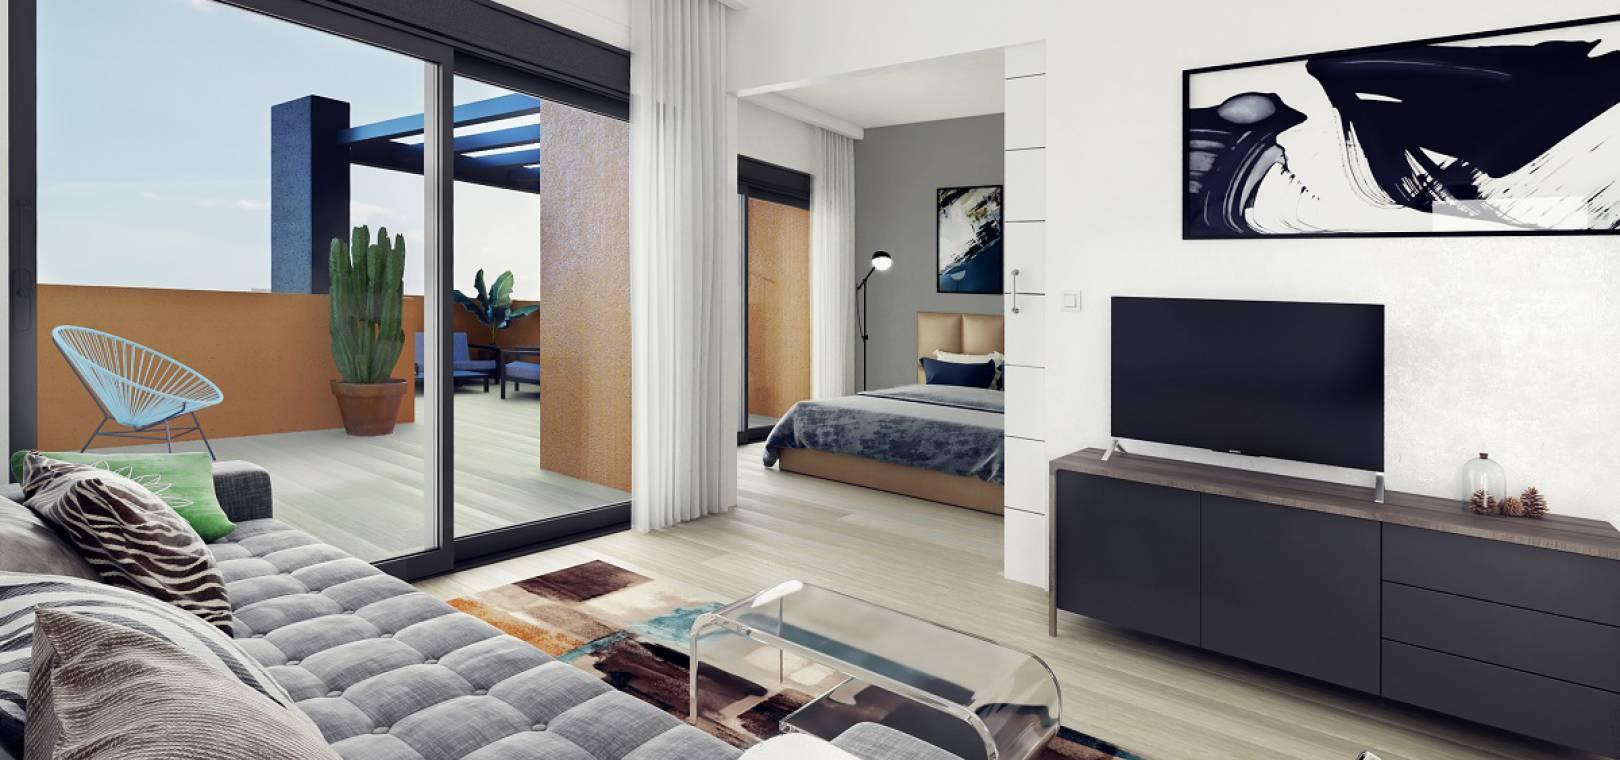 Palapa_Golf_Villamartin_New_Build_Properties_For_Sale_10